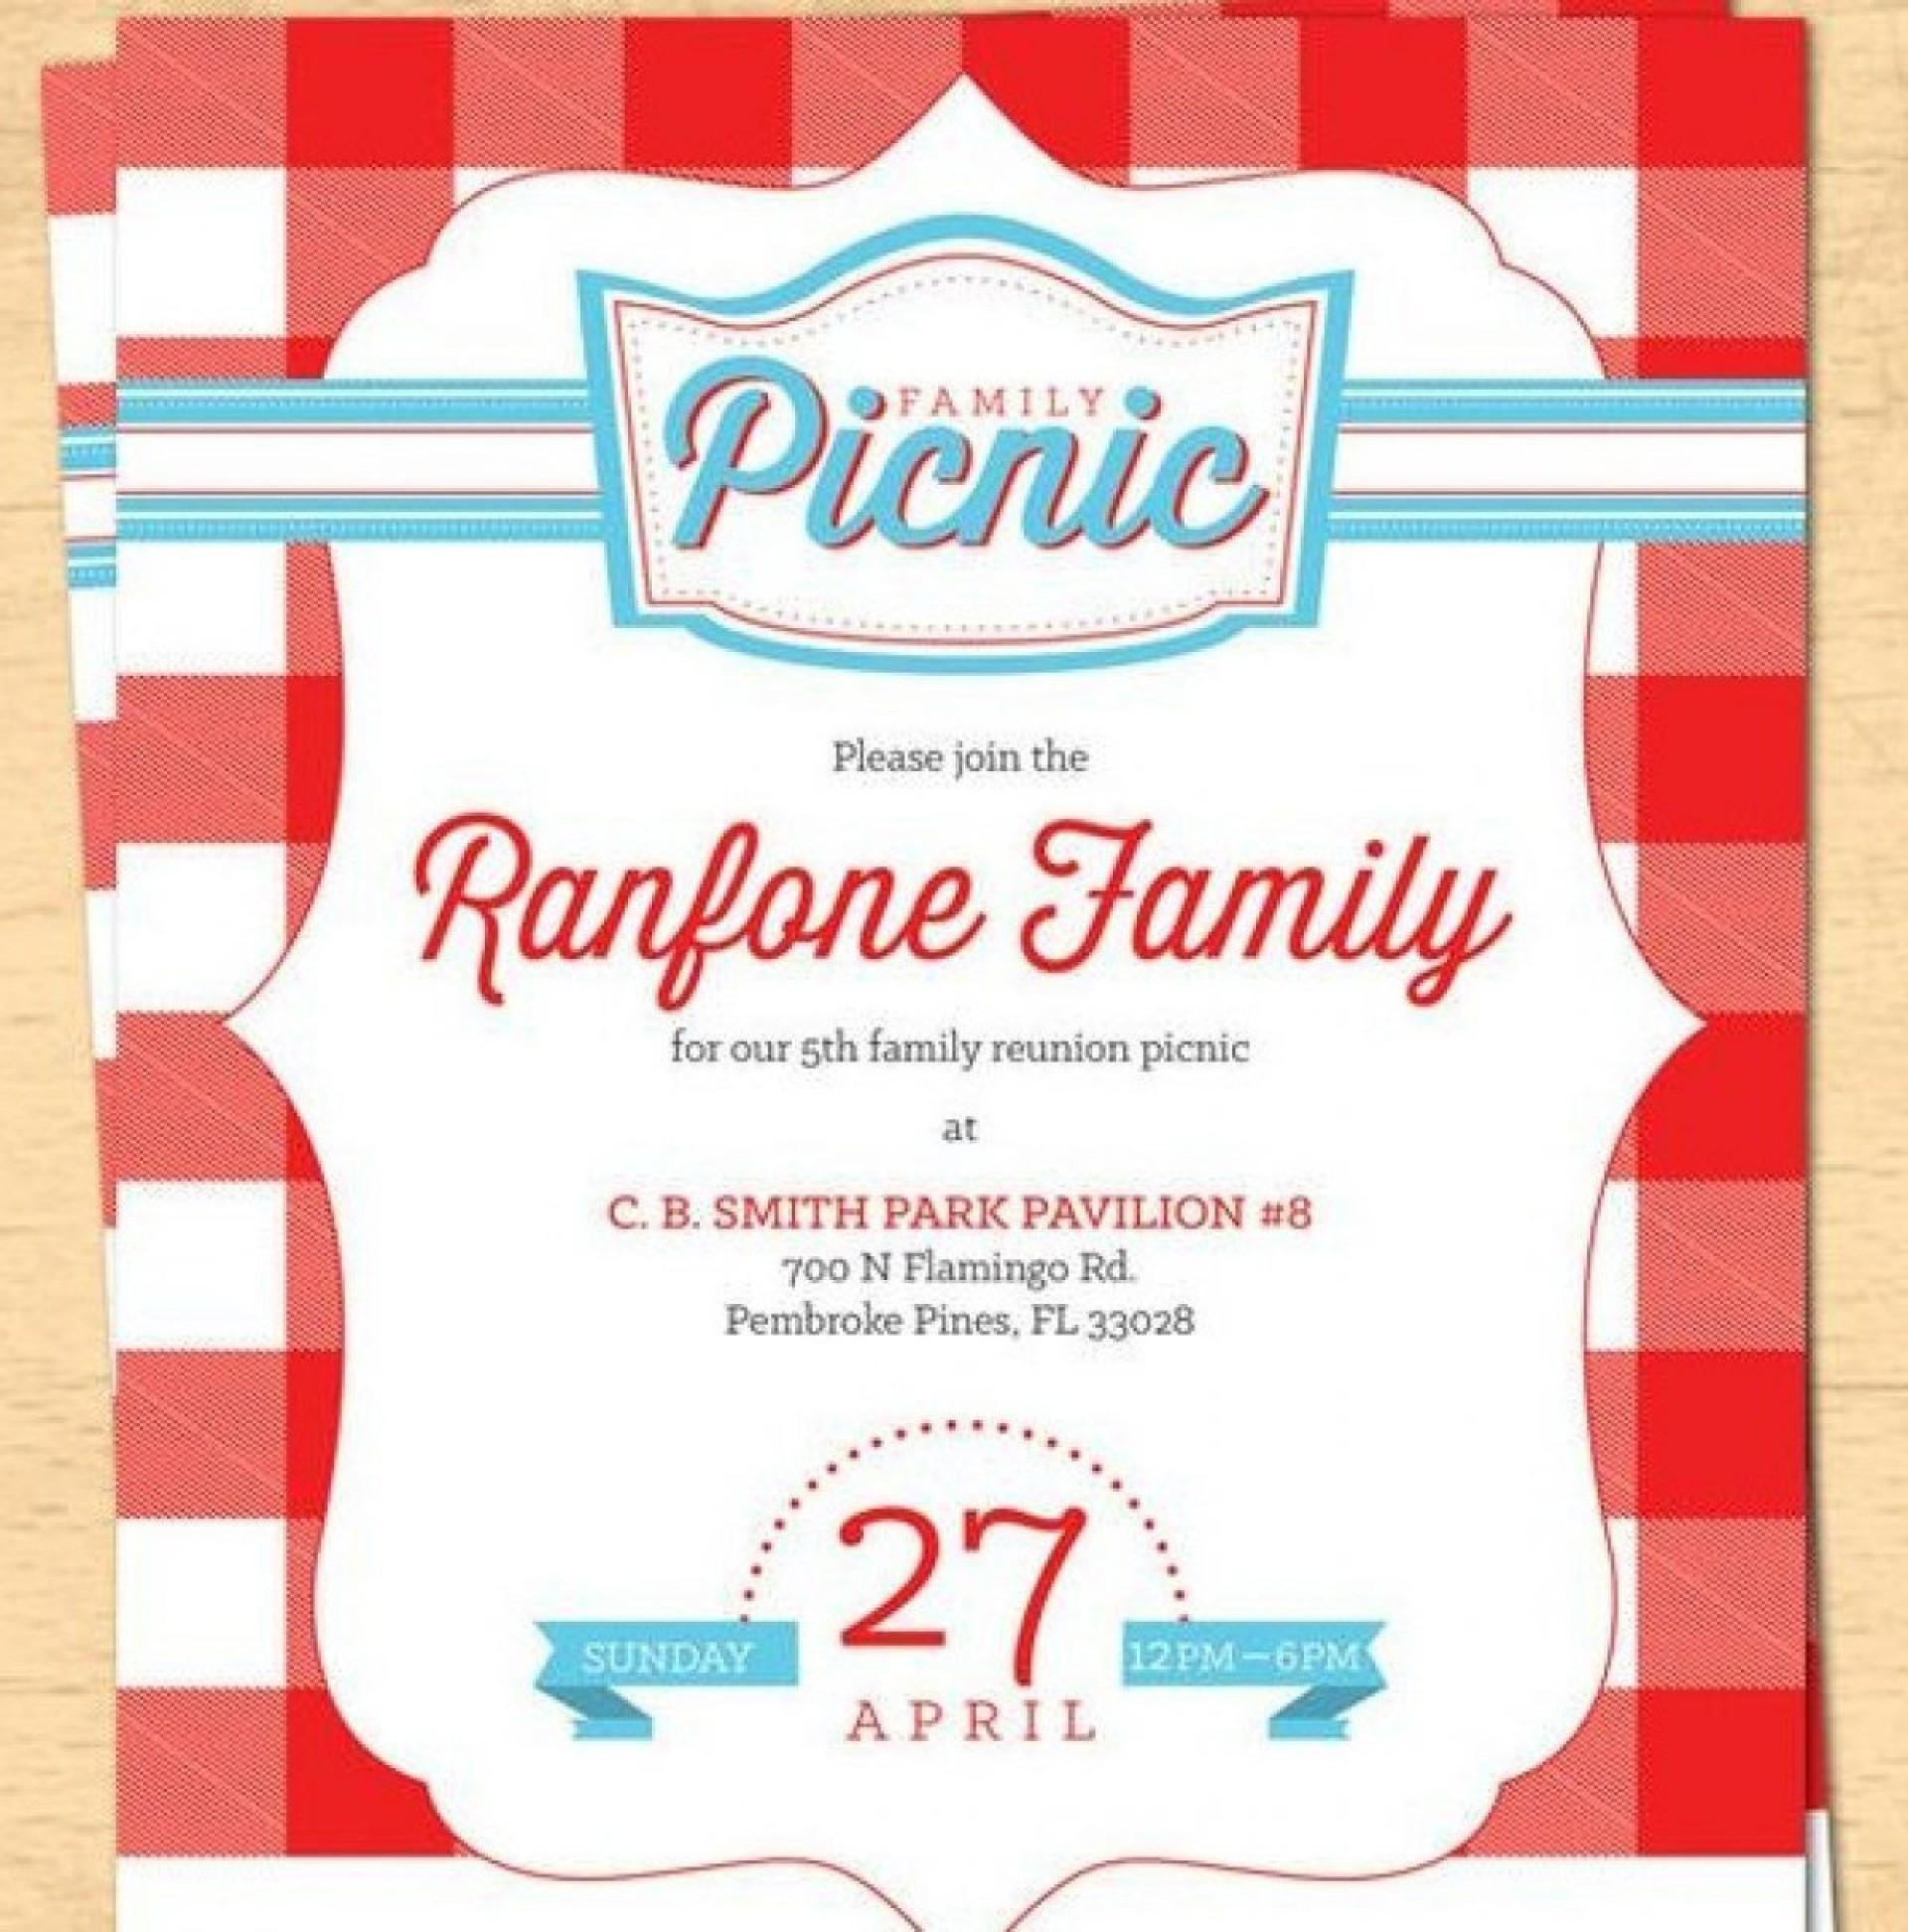 007 Wondrou Family Reunion Flyer Template Free Inspiration  Downloadable Printable Invitation1920